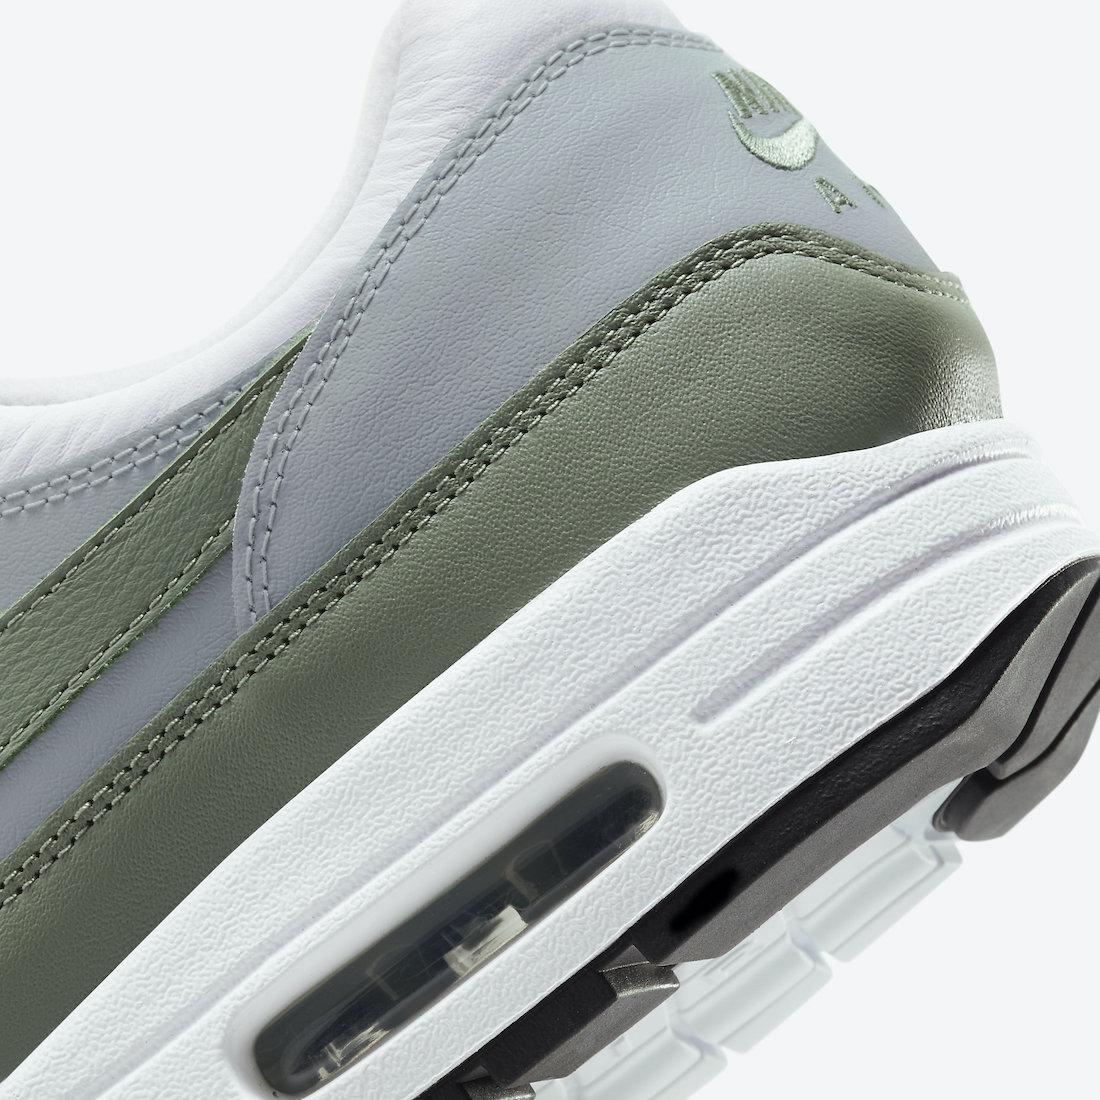 Nike-Air-Max-1-Spiral-Sage-DB5074-100-Release-Date-7